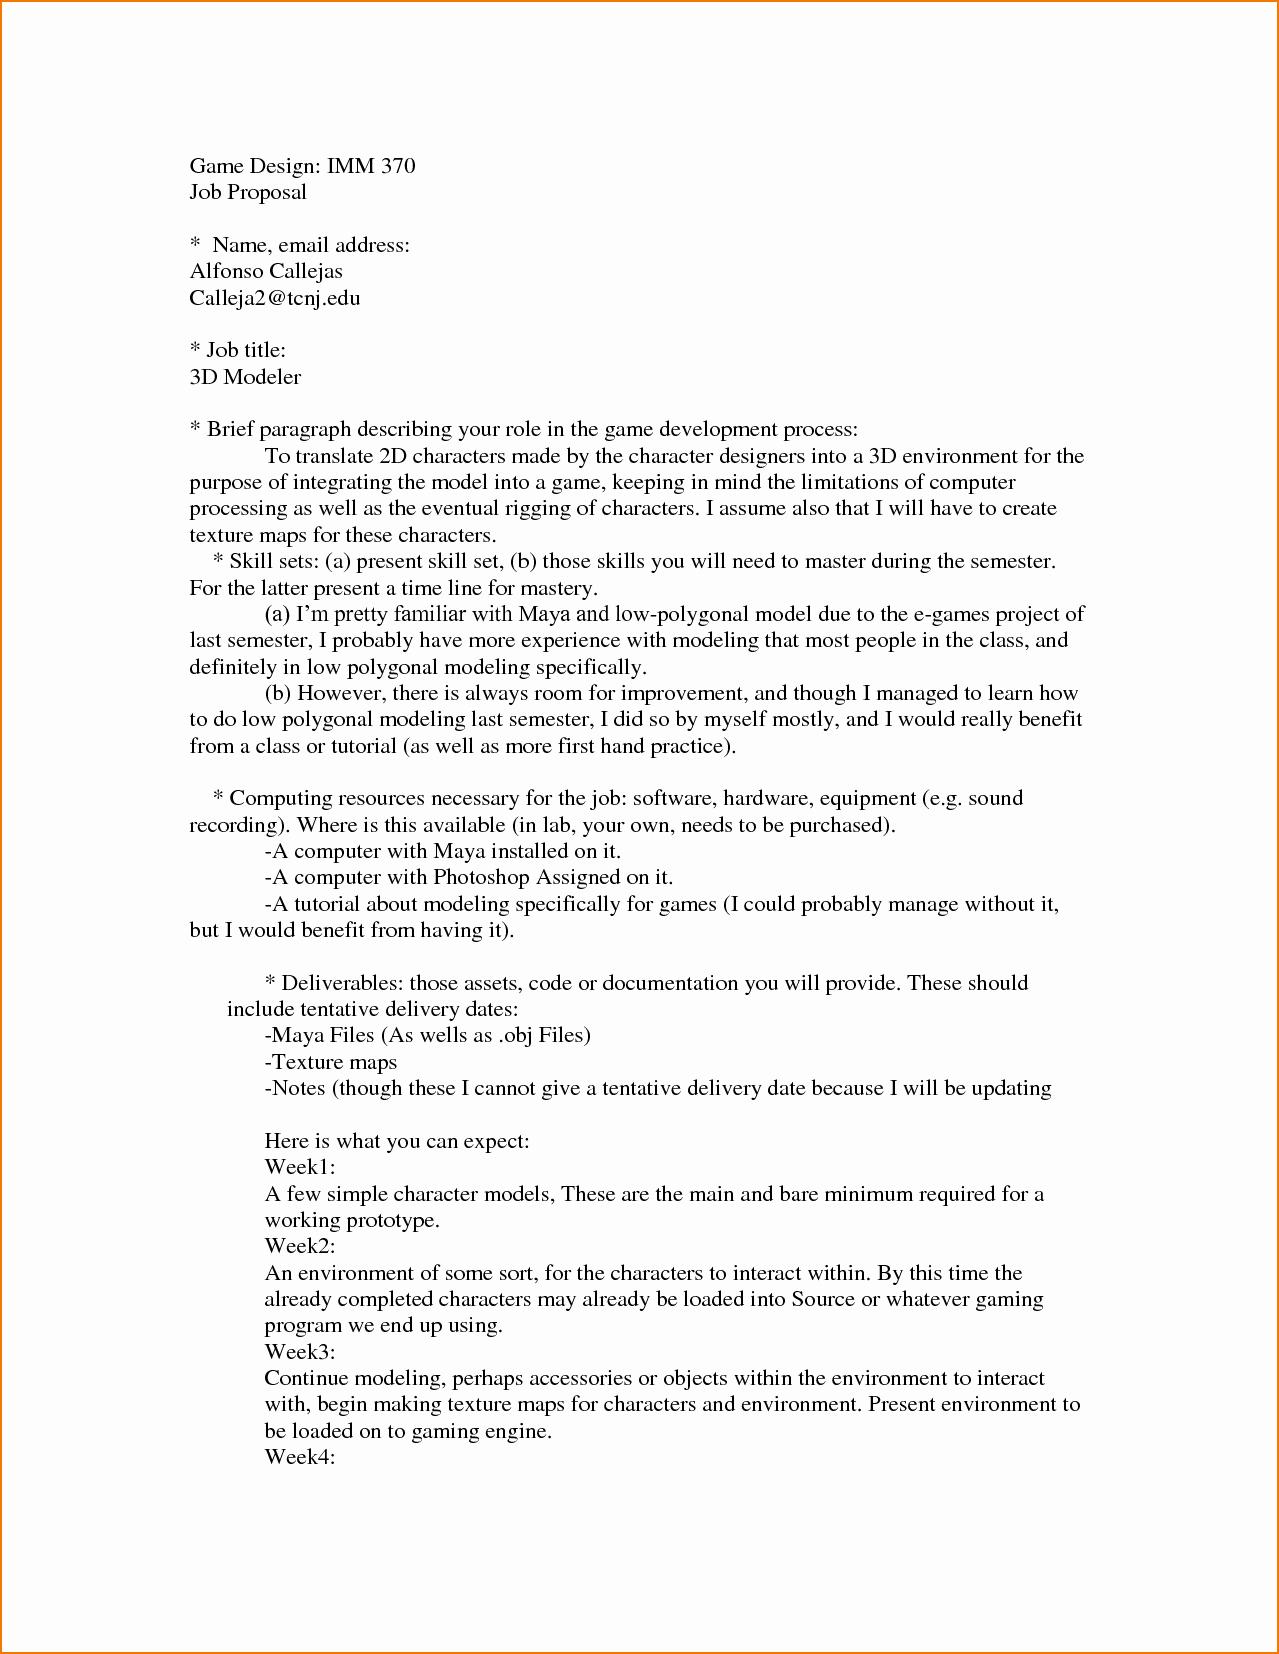 Sample Job Proposal Template Fresh 4 Job Proposal Sample